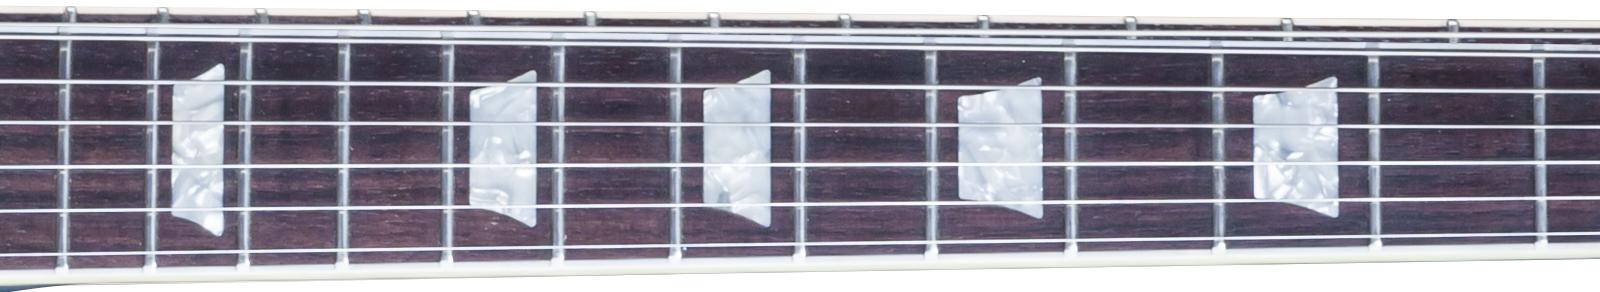 LPJBBBSAPBNH1 NECK SIDE - 2015 Gibson Custom Shop Bonamassa Bonabyrd Pelham Blue Hand Signed #91